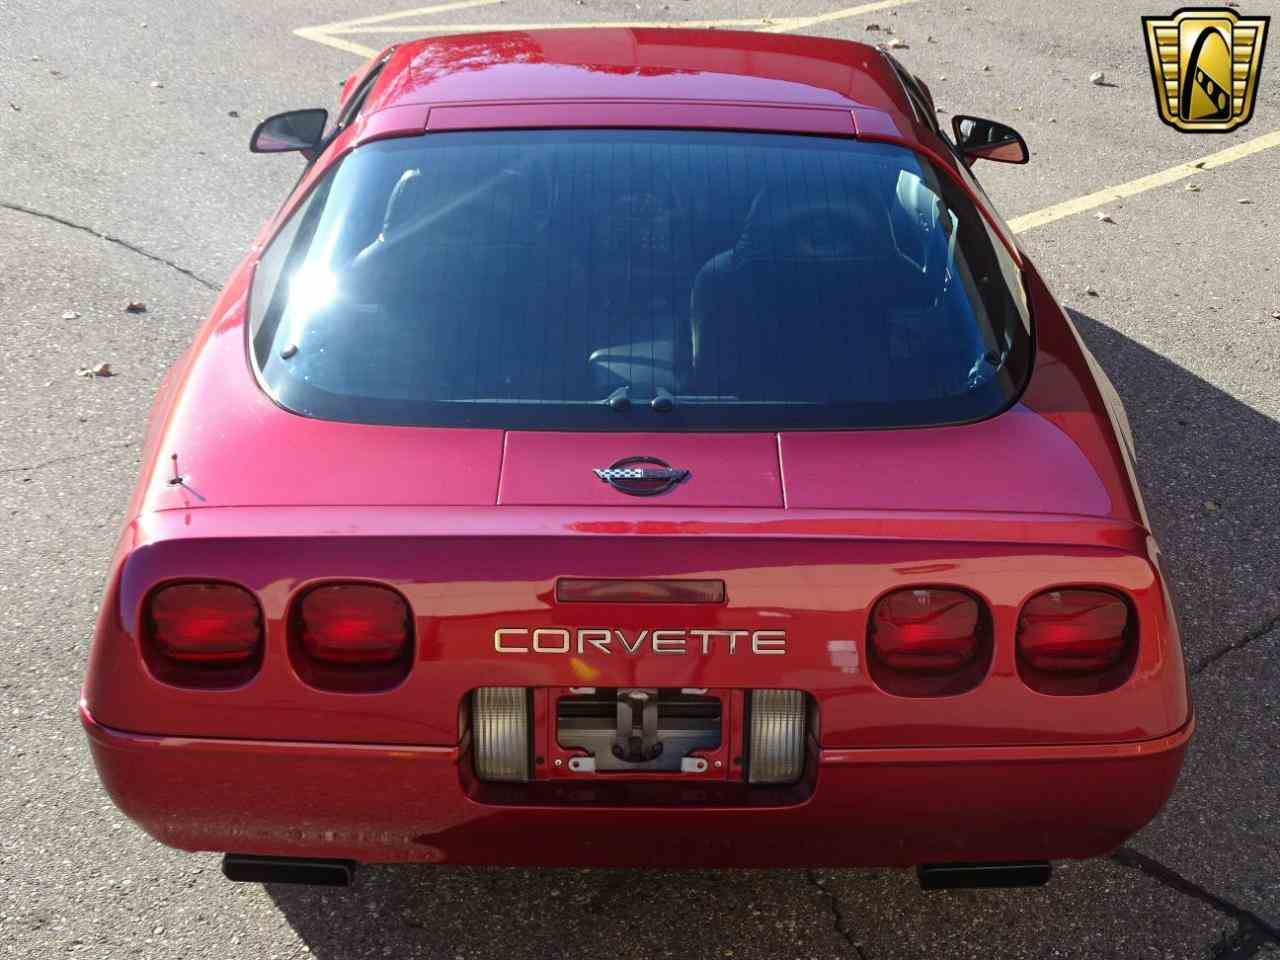 Corvette 1994 chevy corvette : 1994 Chevrolet Corvette for Sale | ClassicCars.com | CC-1046759